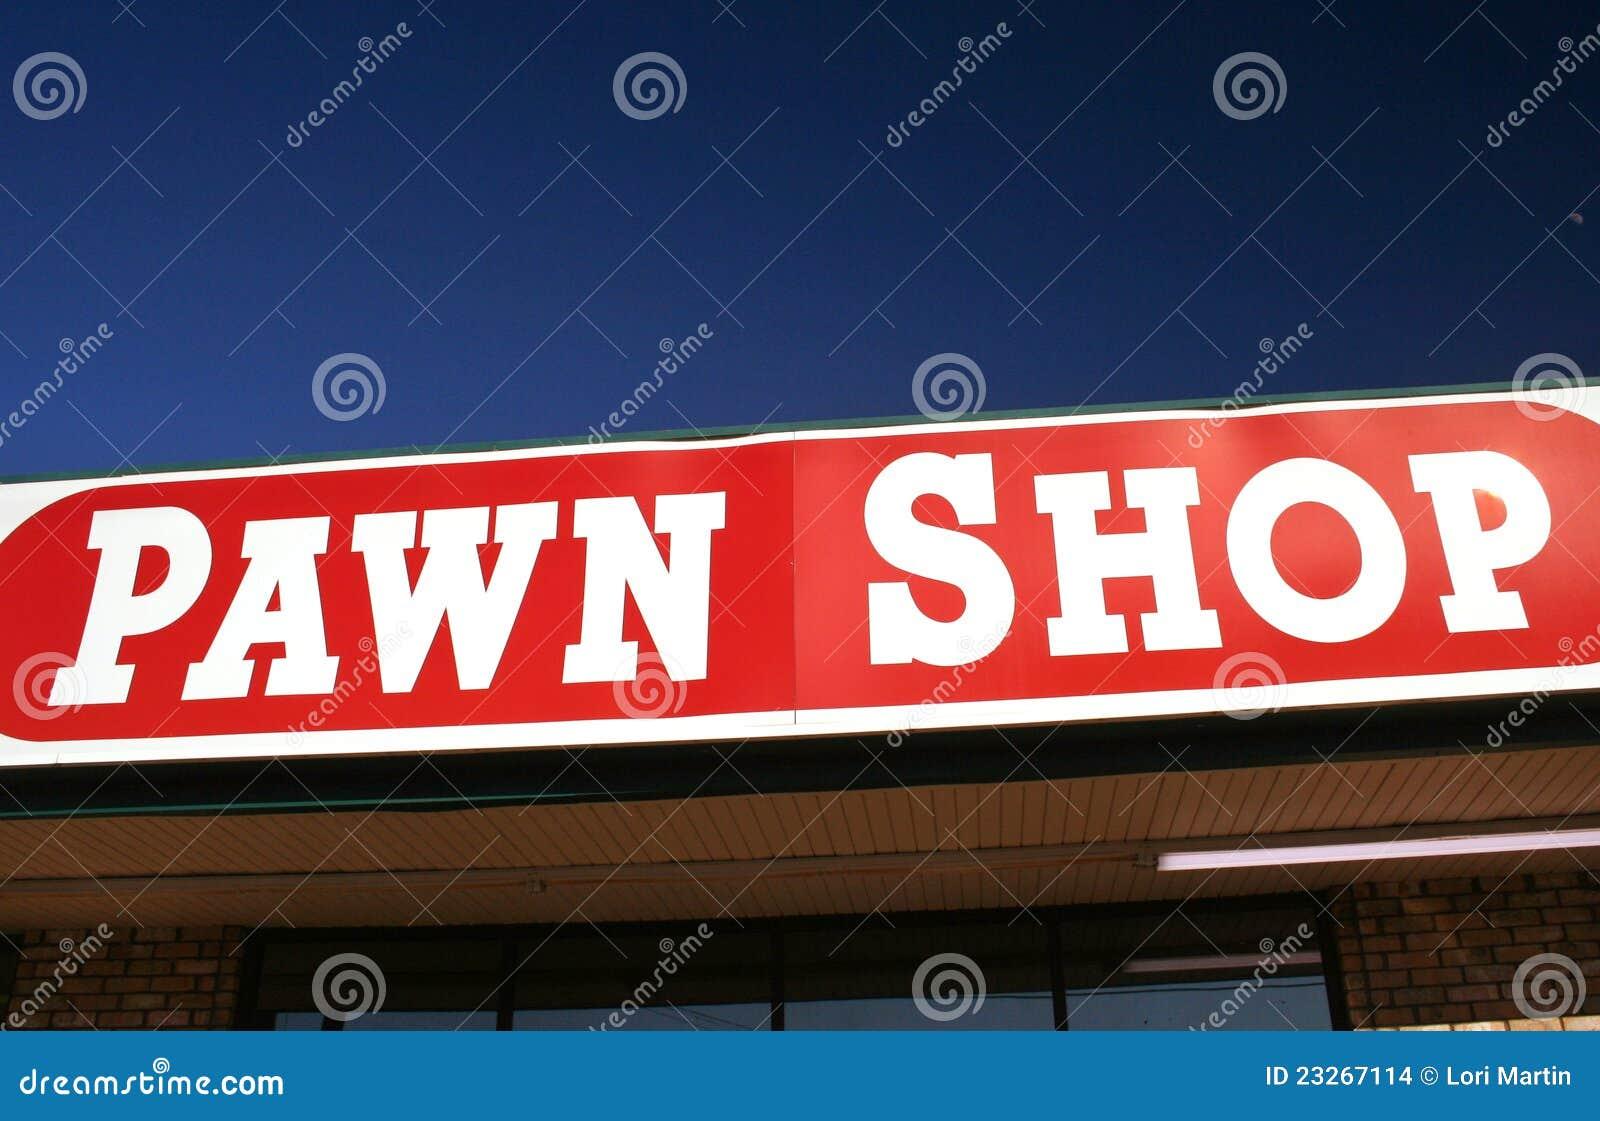 pawn shop clip art free - photo #45